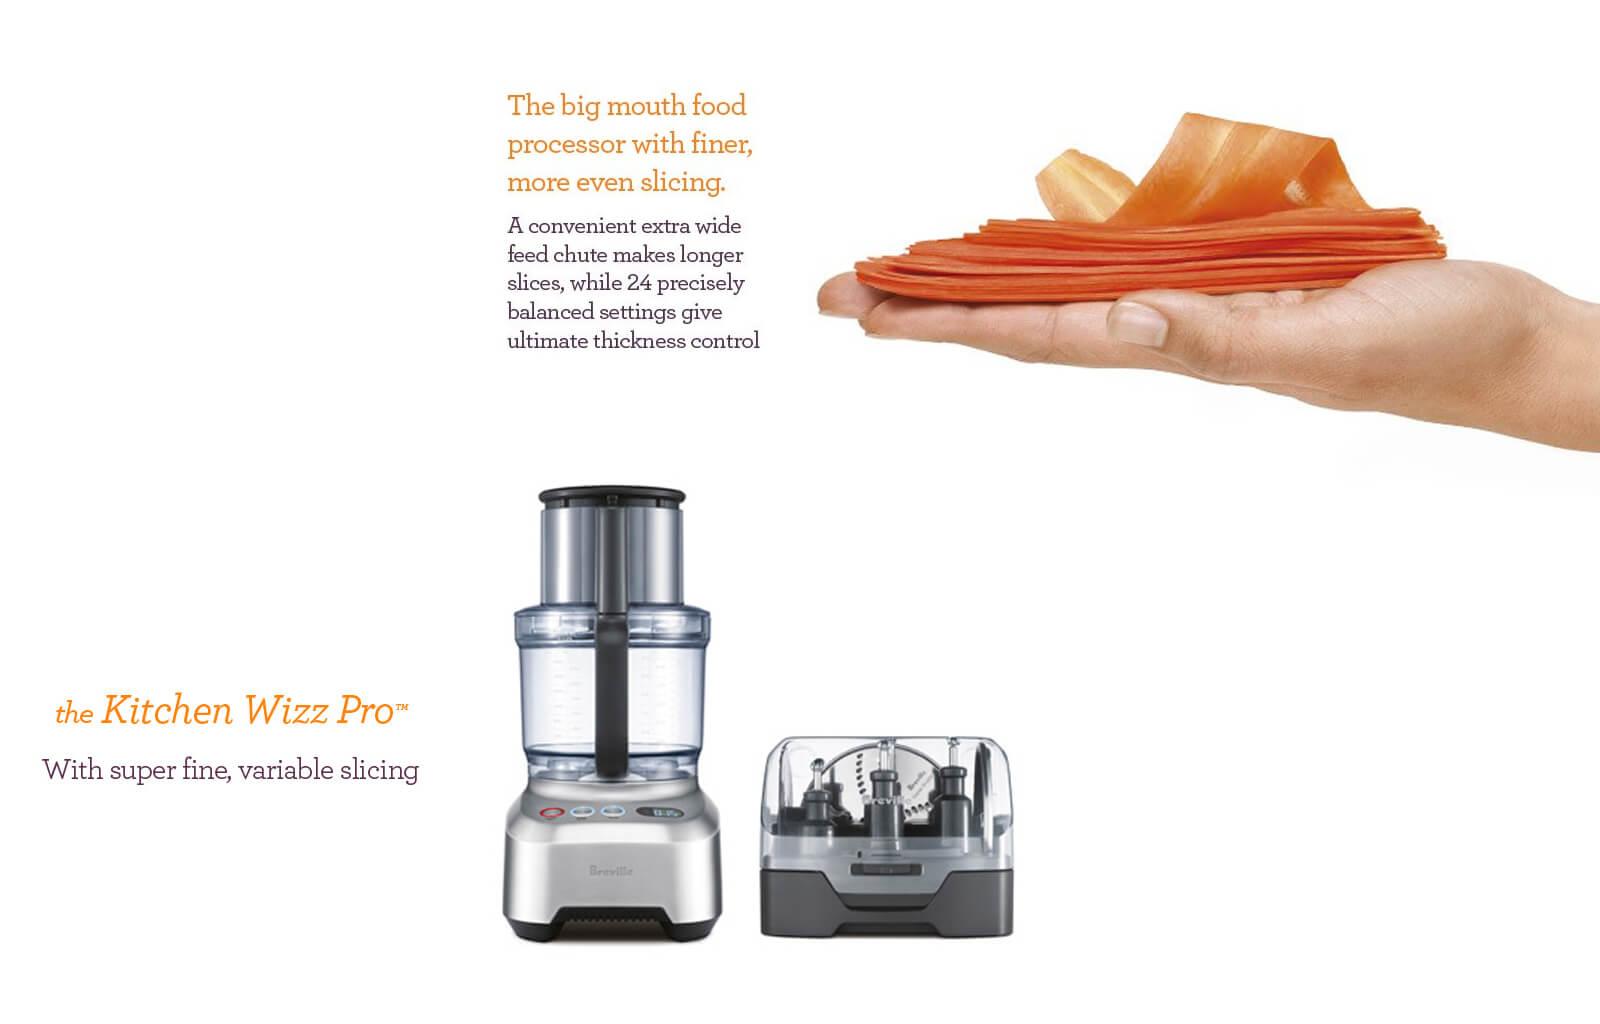 img4127 - Breville Food Processor